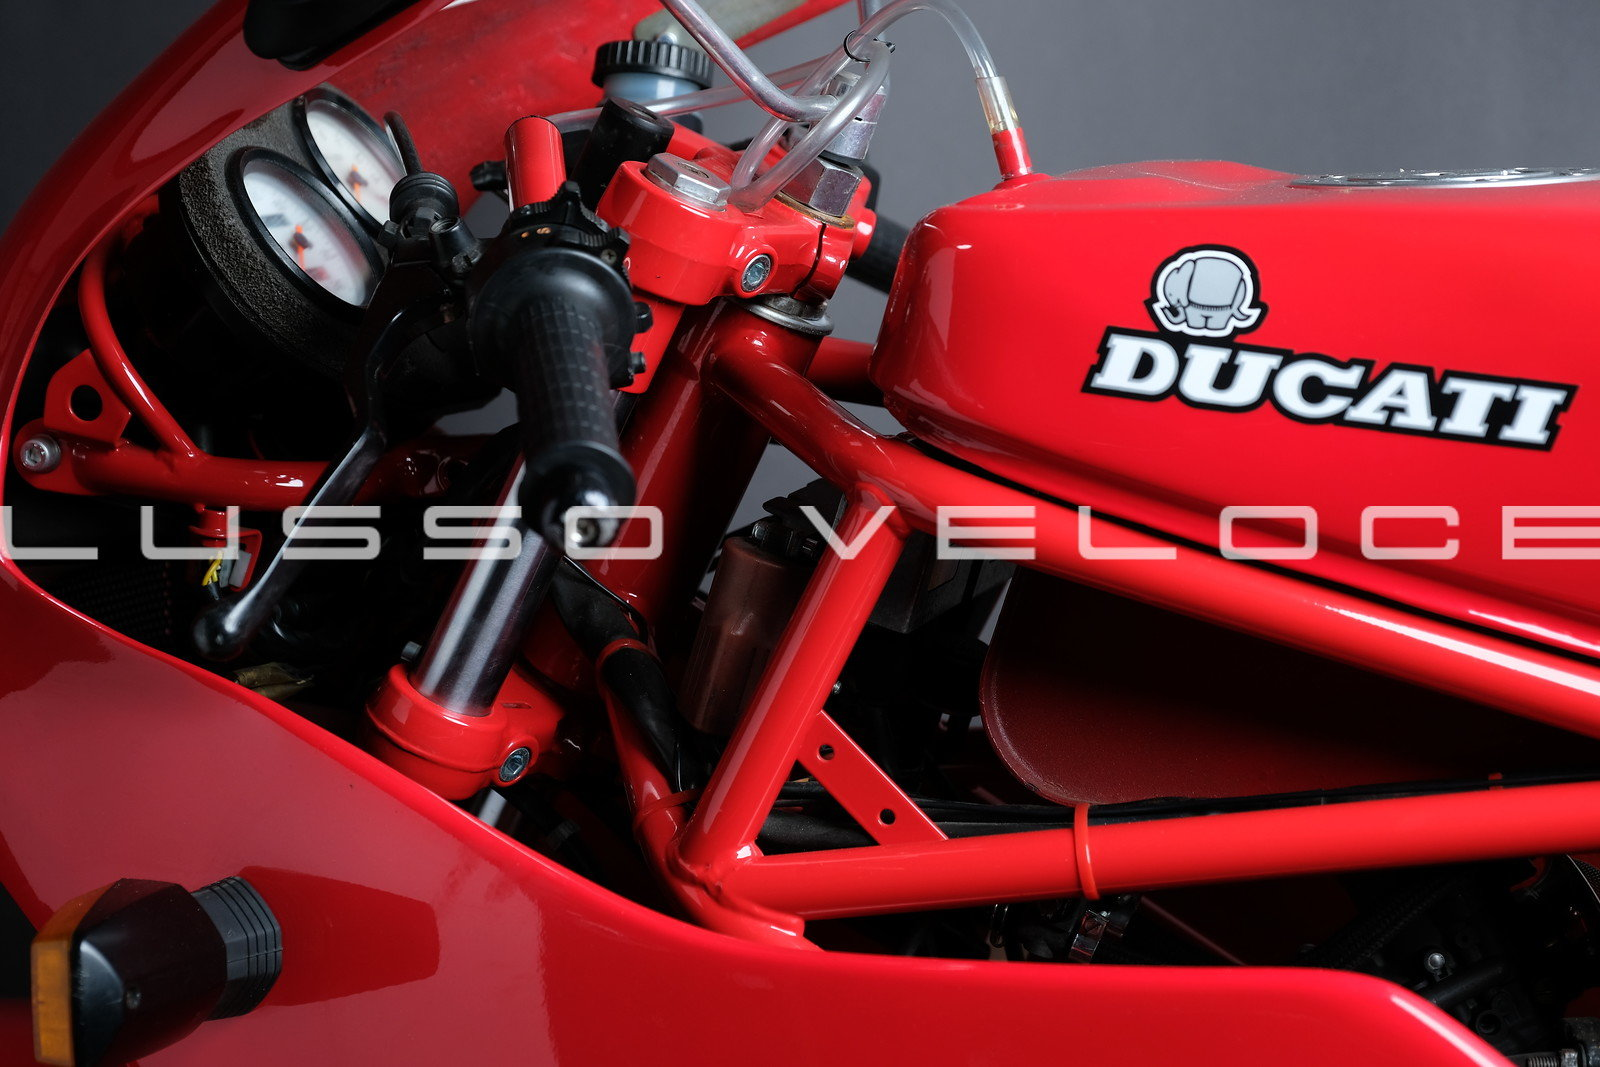 1986 Rare Ducati F3 350 fully restored For Sale (picture 15 of 15)